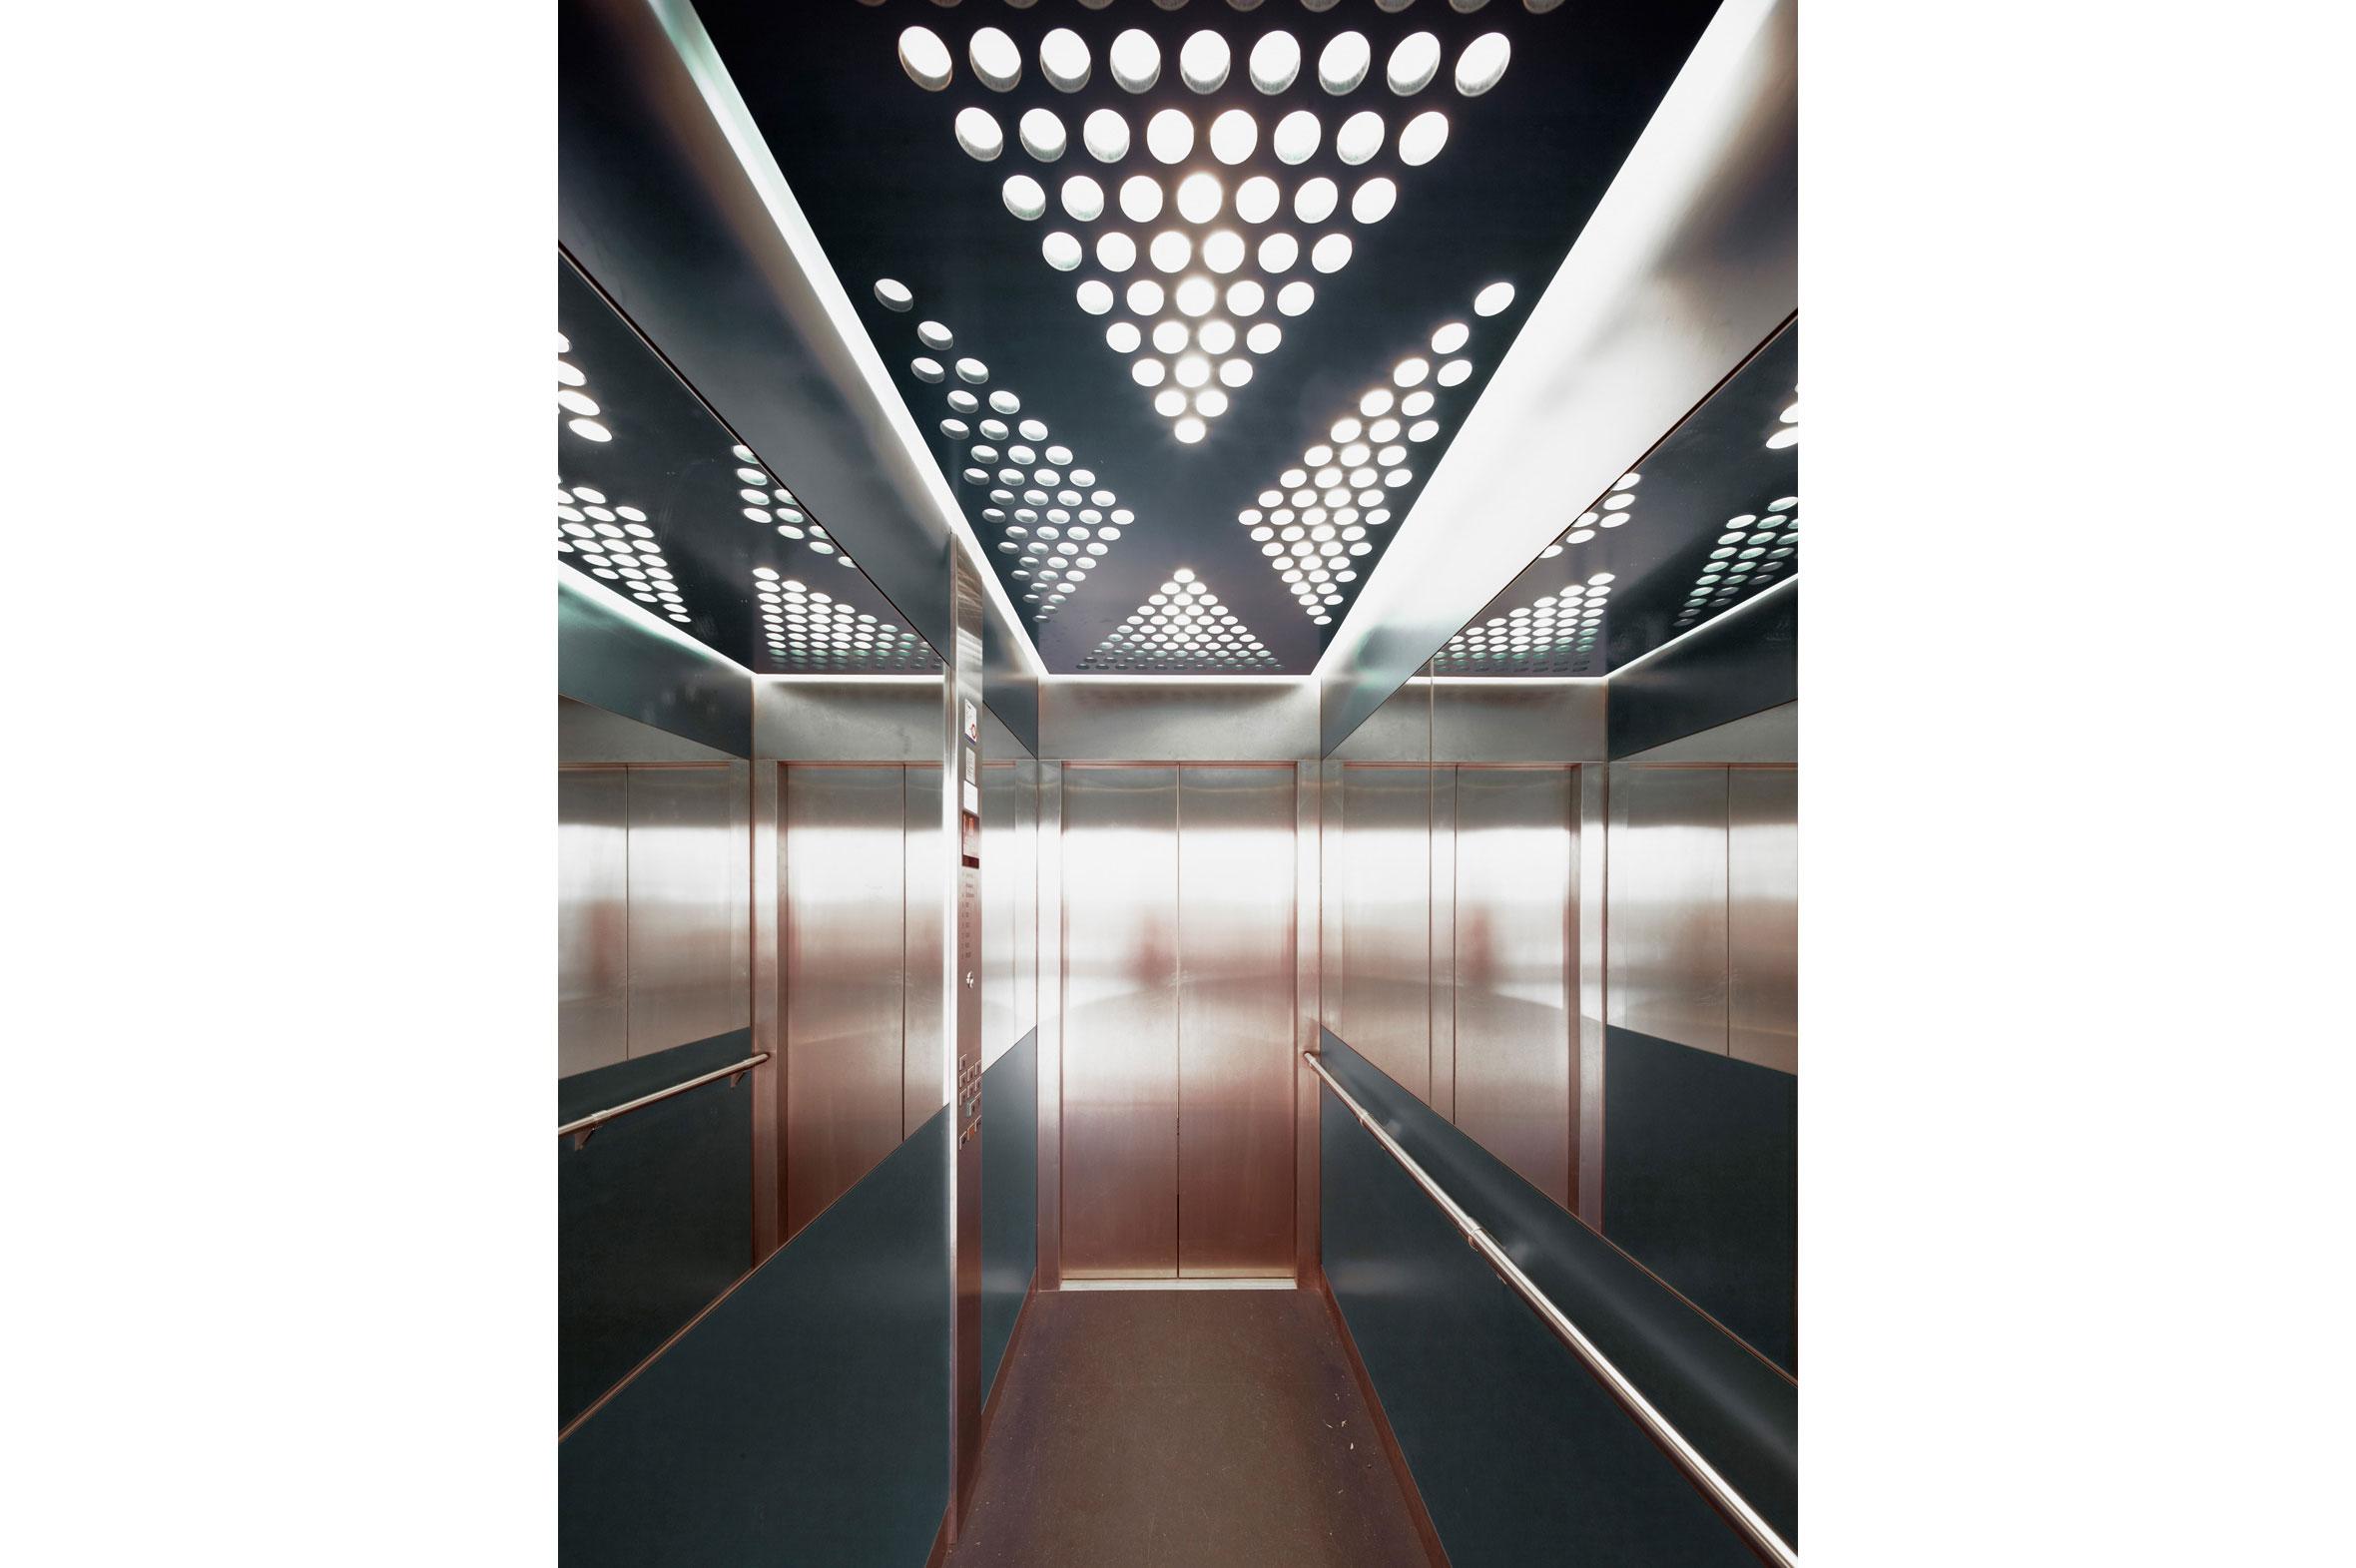 Flat_Iron_Building_stockholm_kontor_insida_foto4_varg_arkitekter_vit_kant